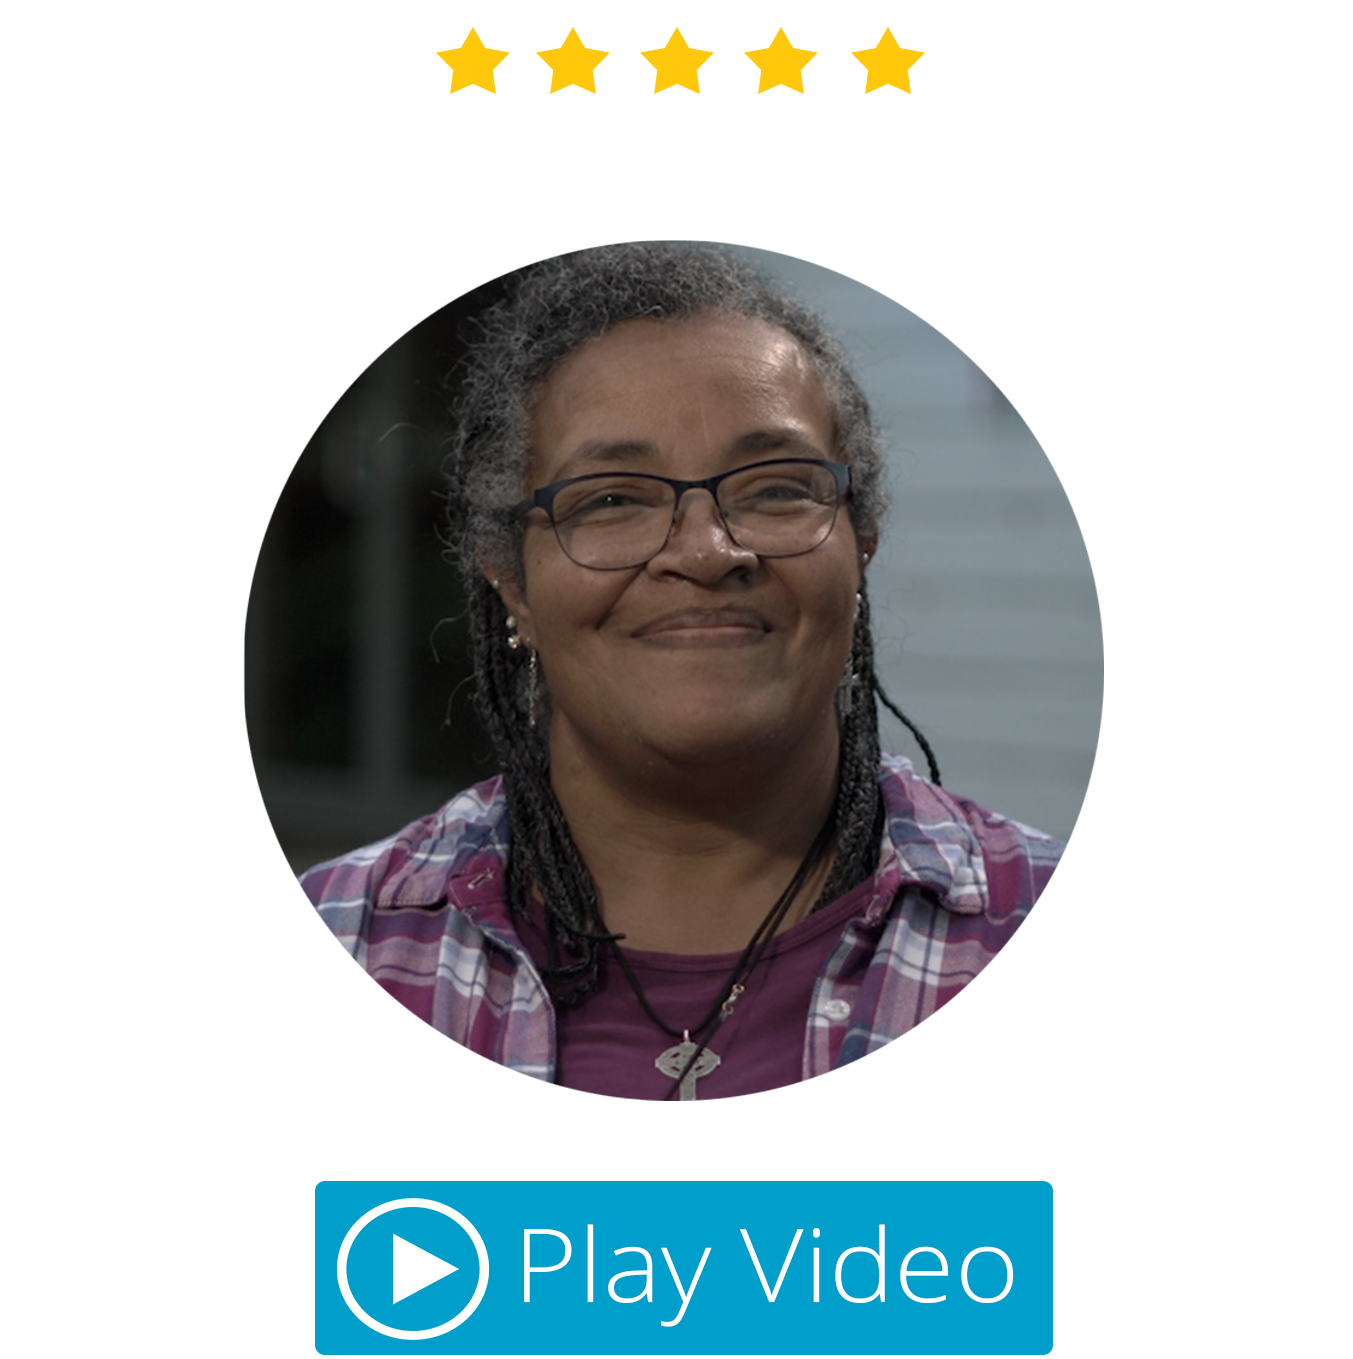 <b>Ruth Foss</b><br>Pastor